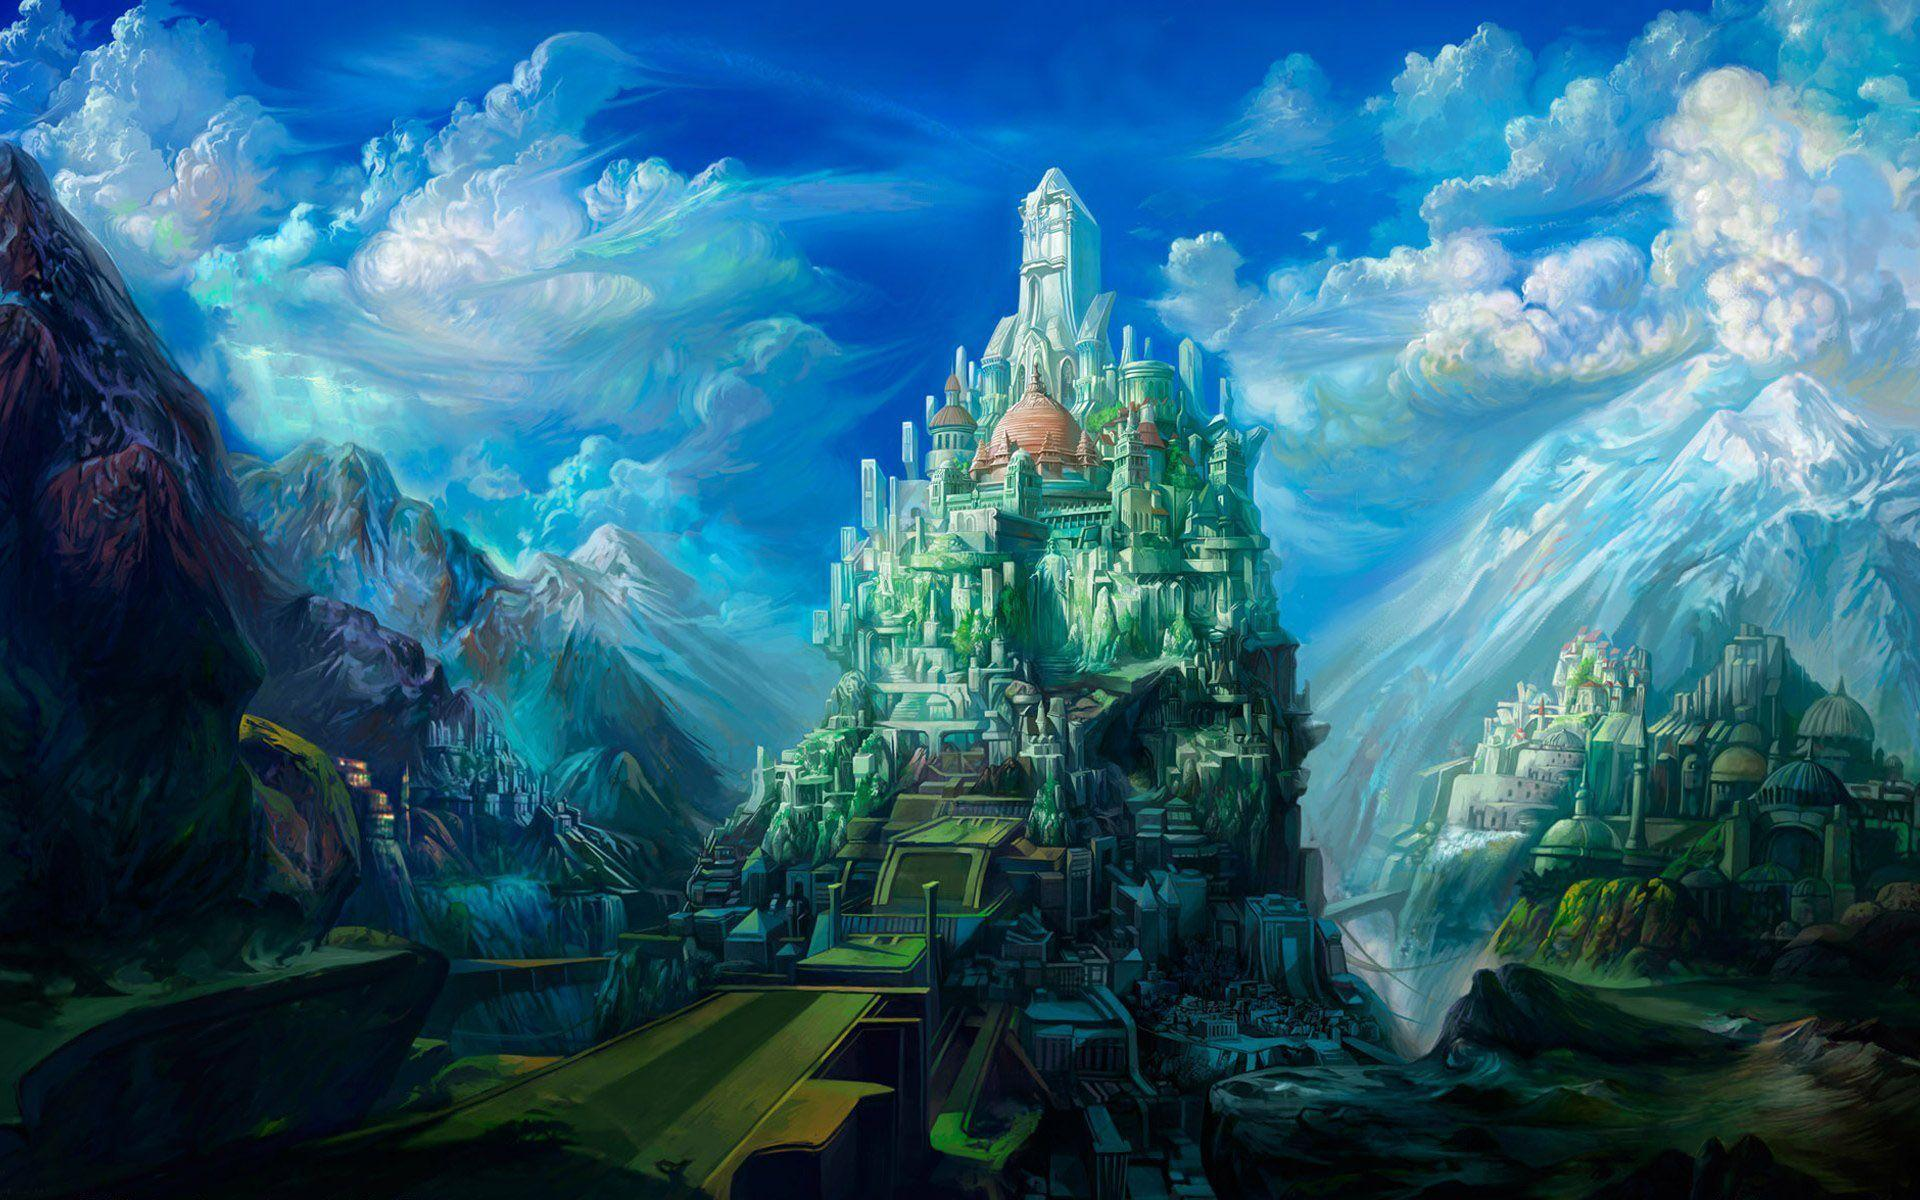 fantasy castle wallpapers - wallpaper cave